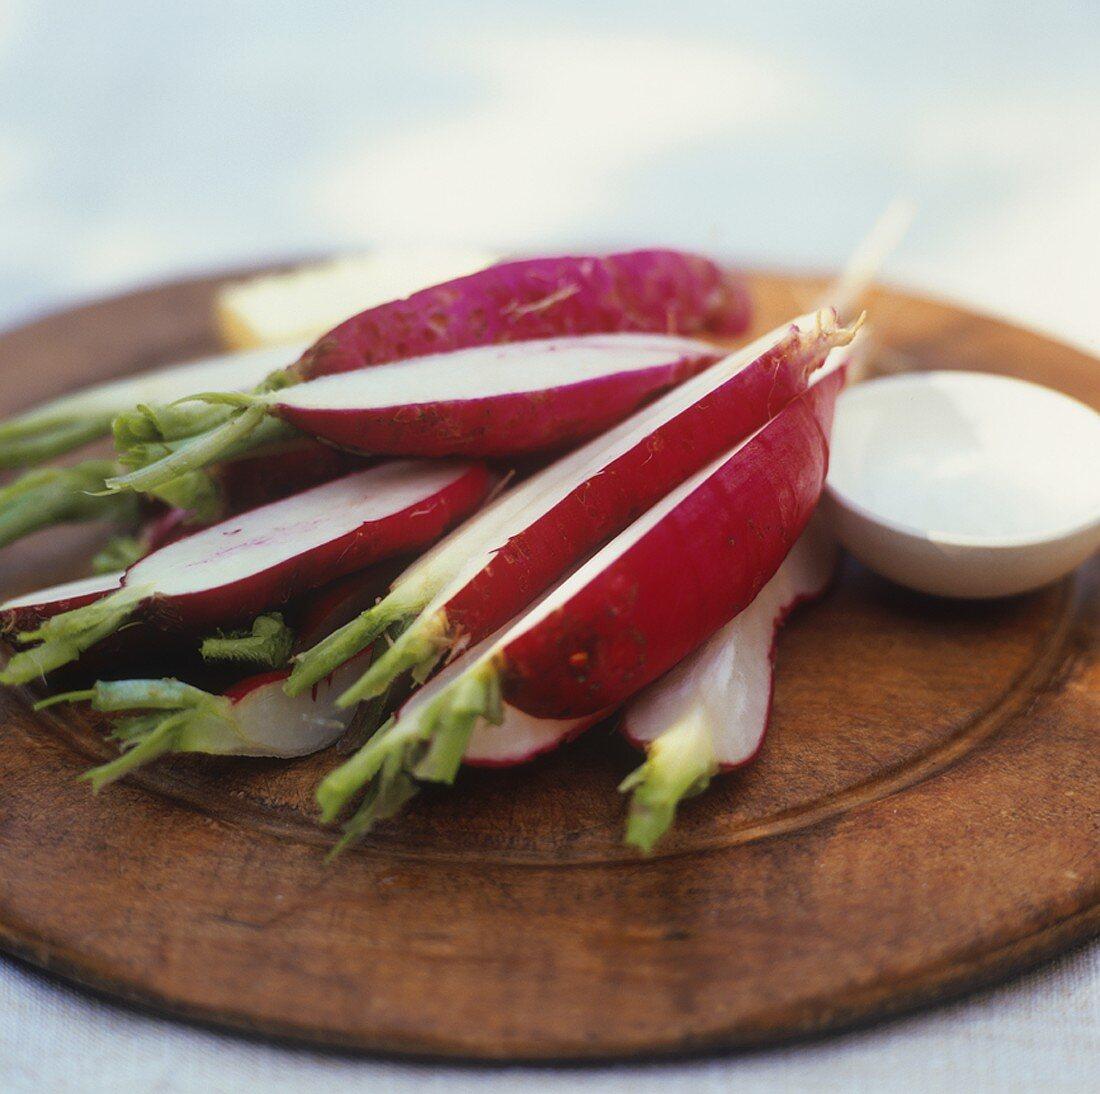 Sliced radishes